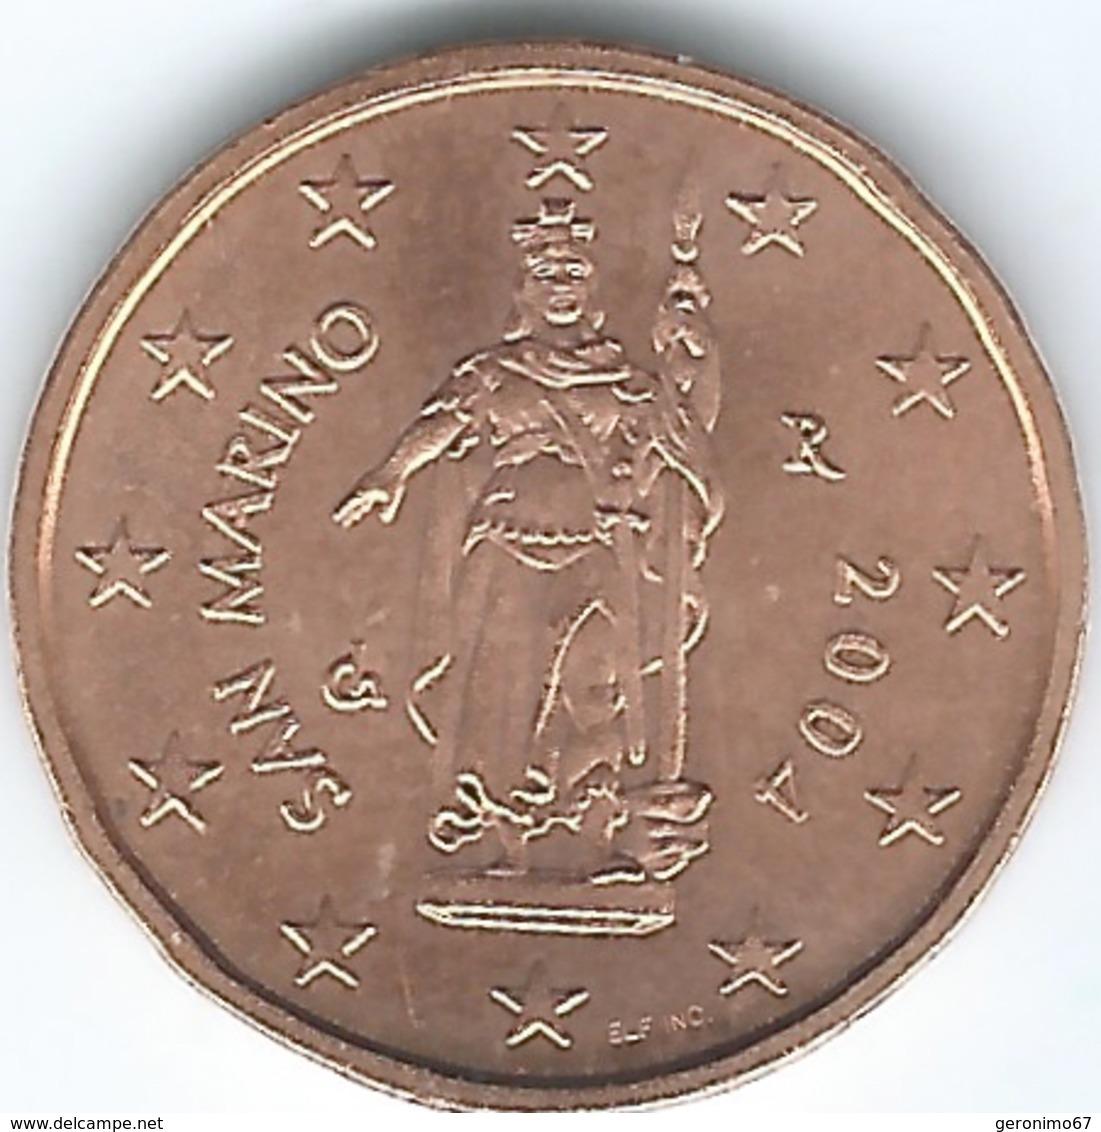 San Marino - 2 Euro Cent - 2004 - KM441 - San Marino